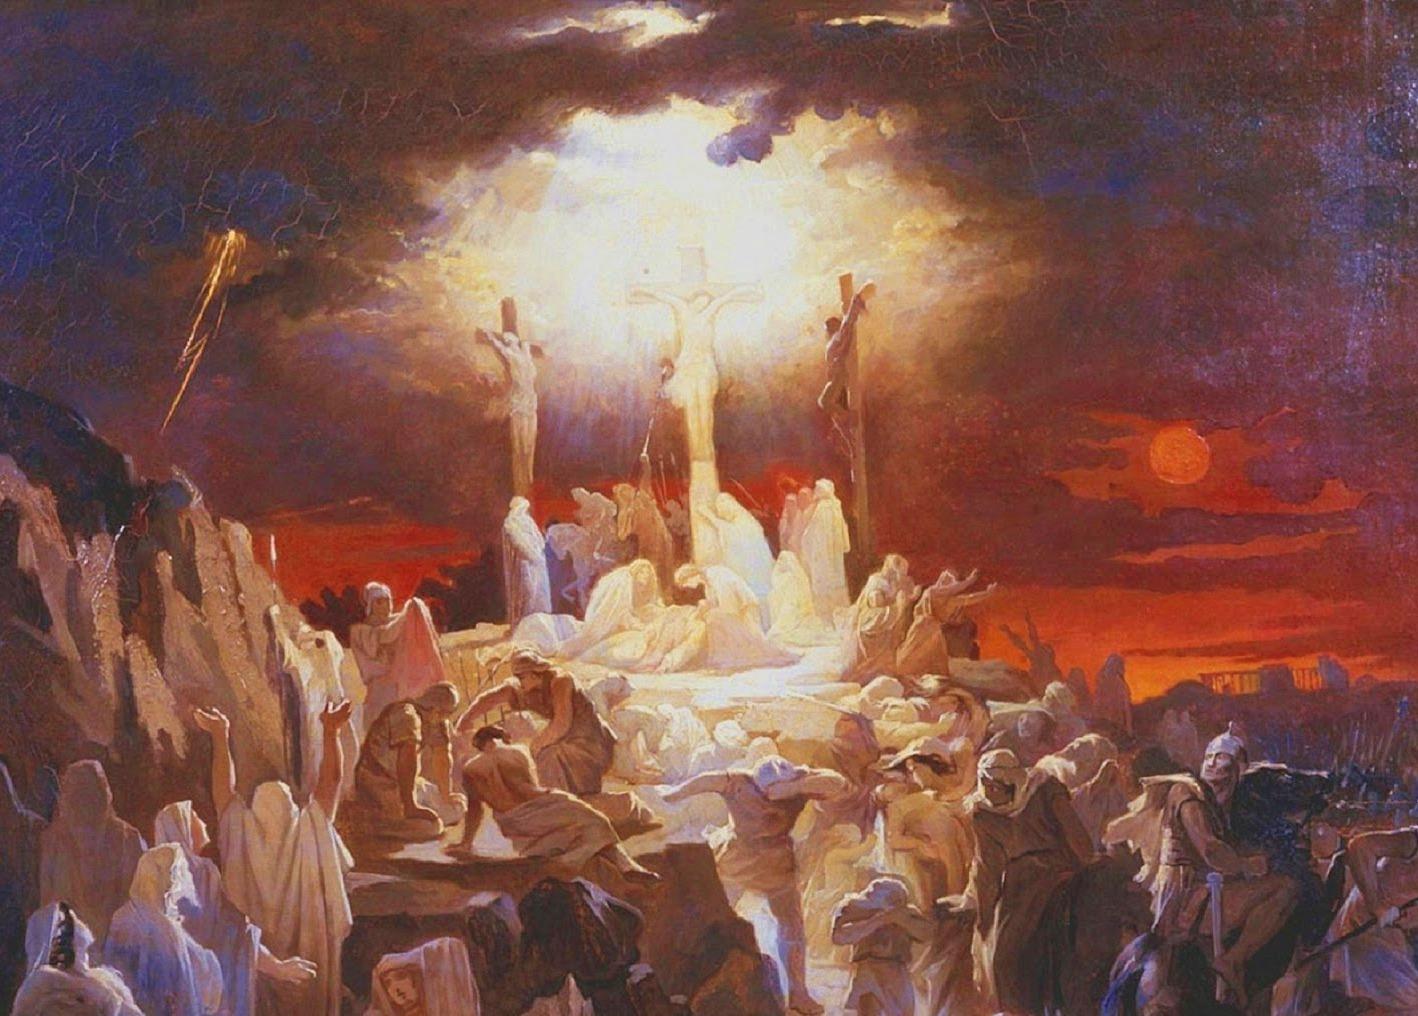 transfigured_by_the_cross